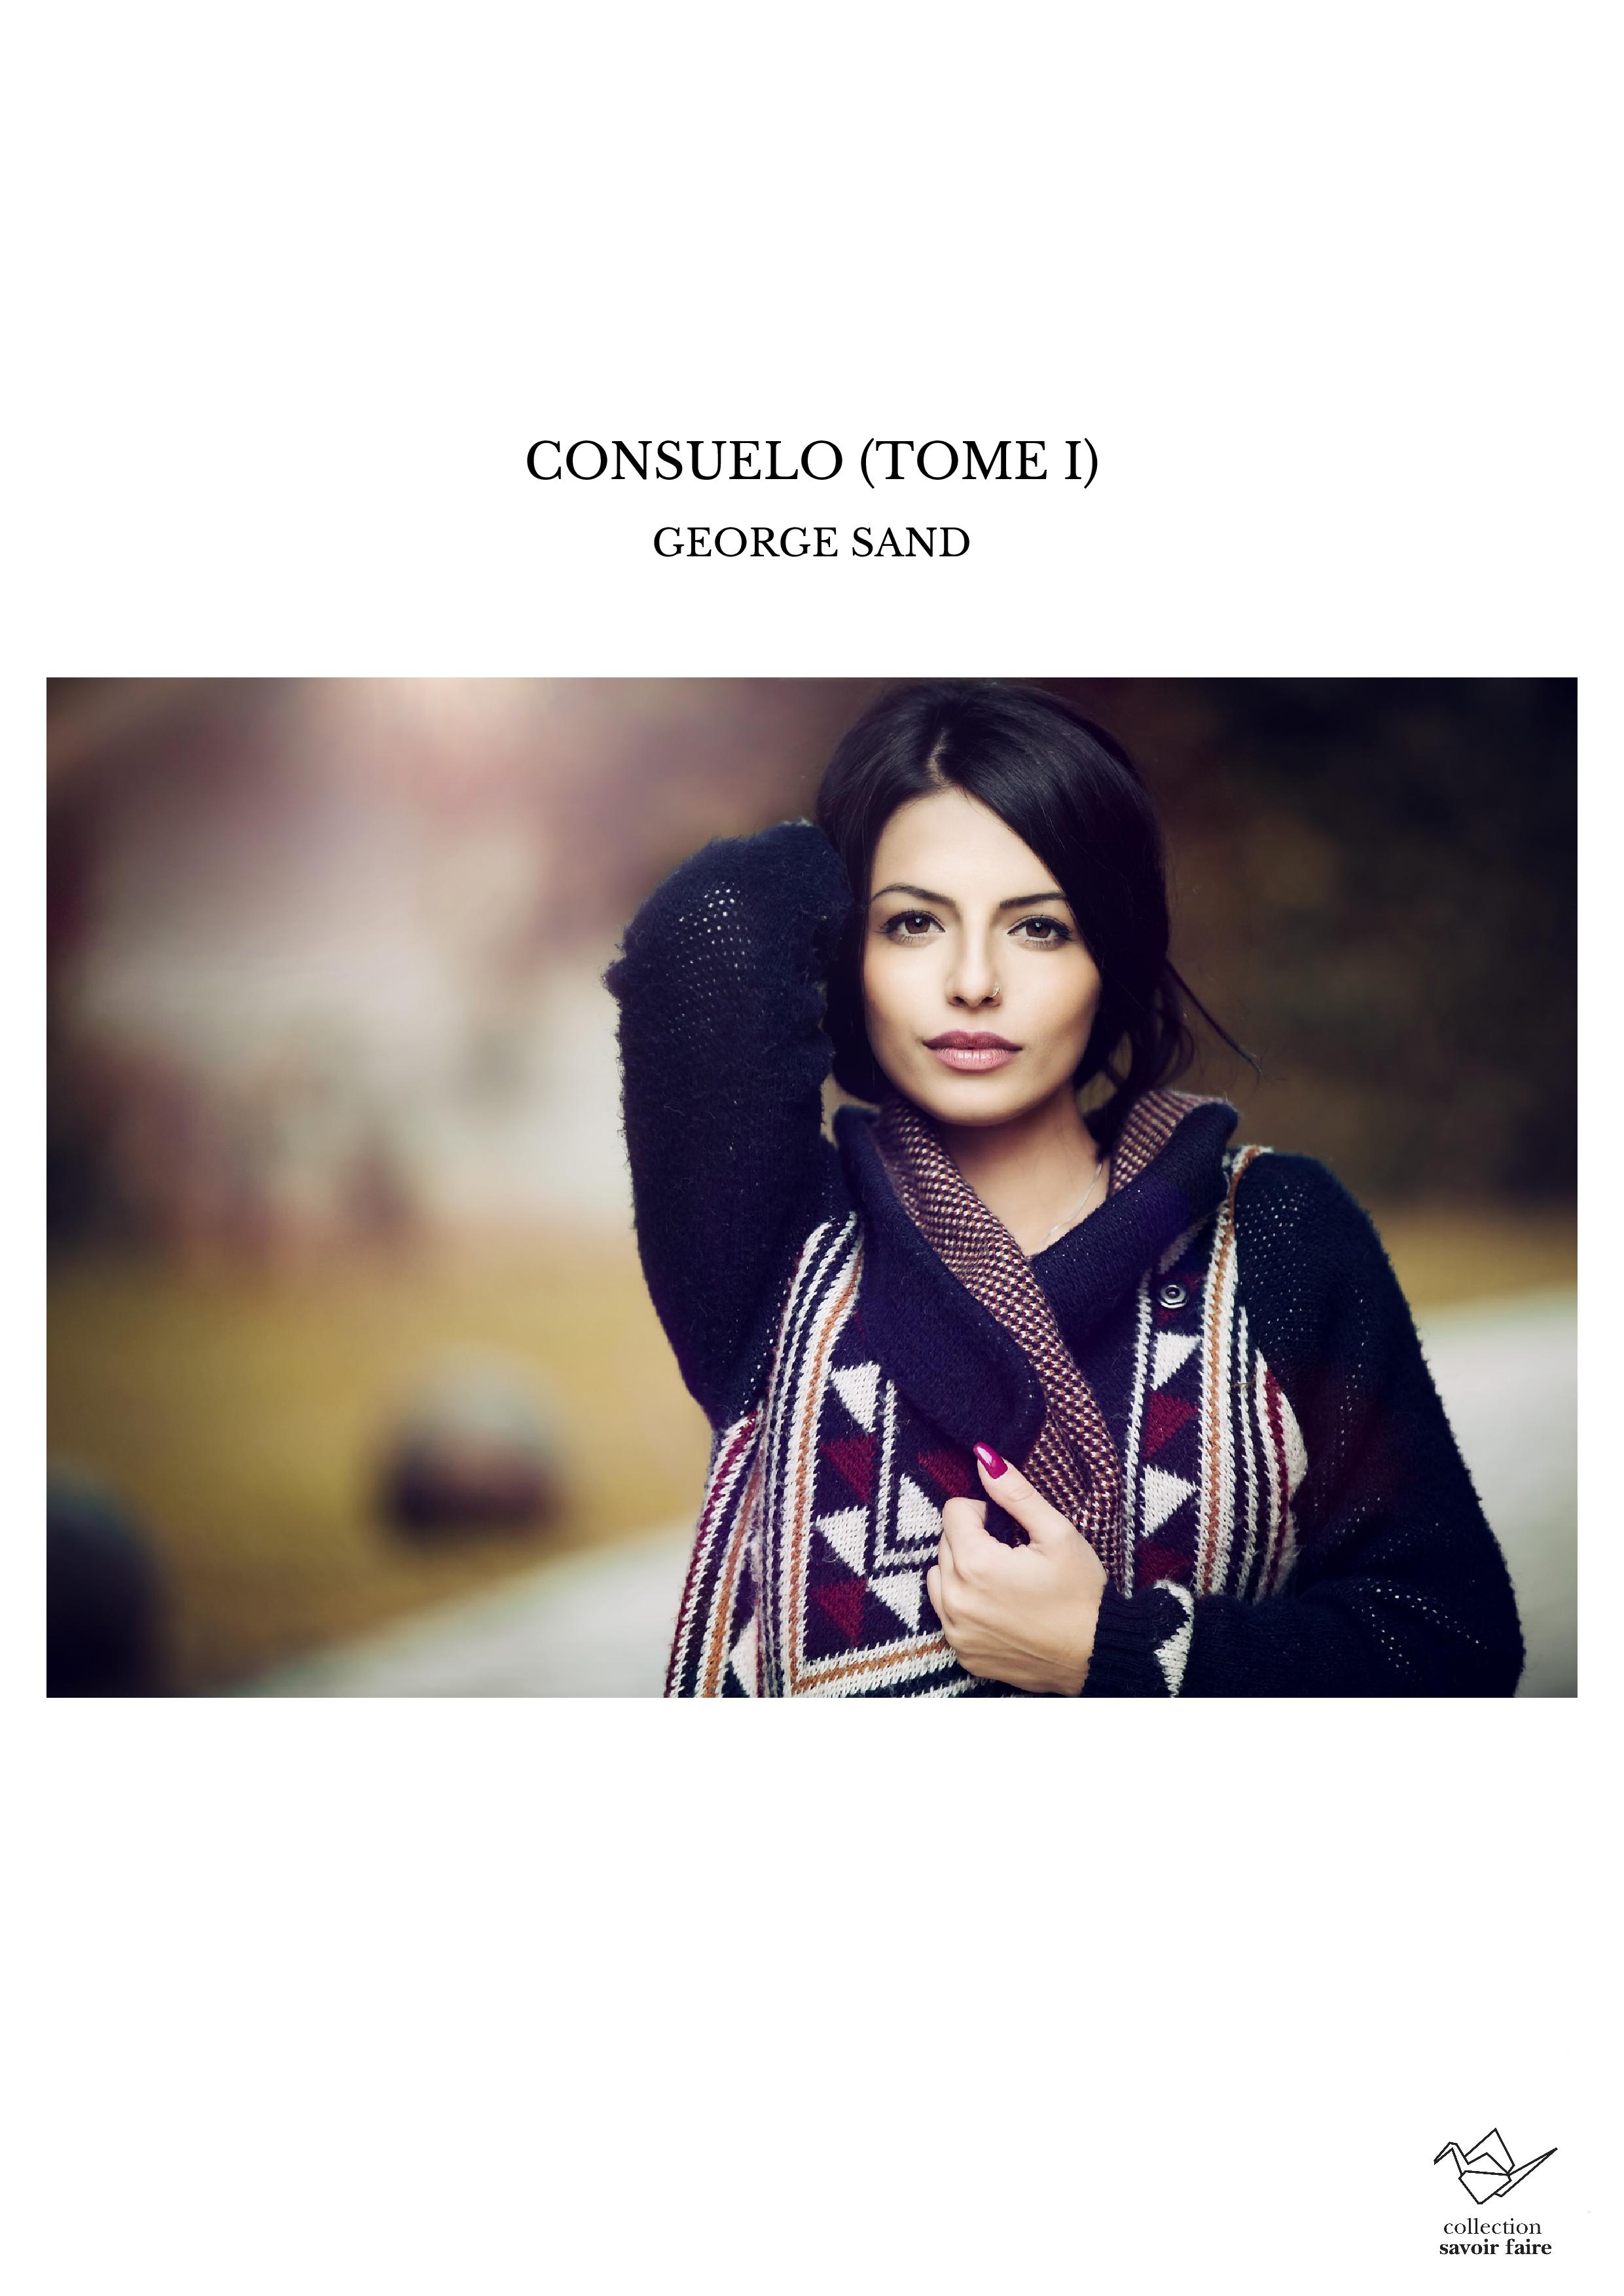 CONSUELO (TOME I)